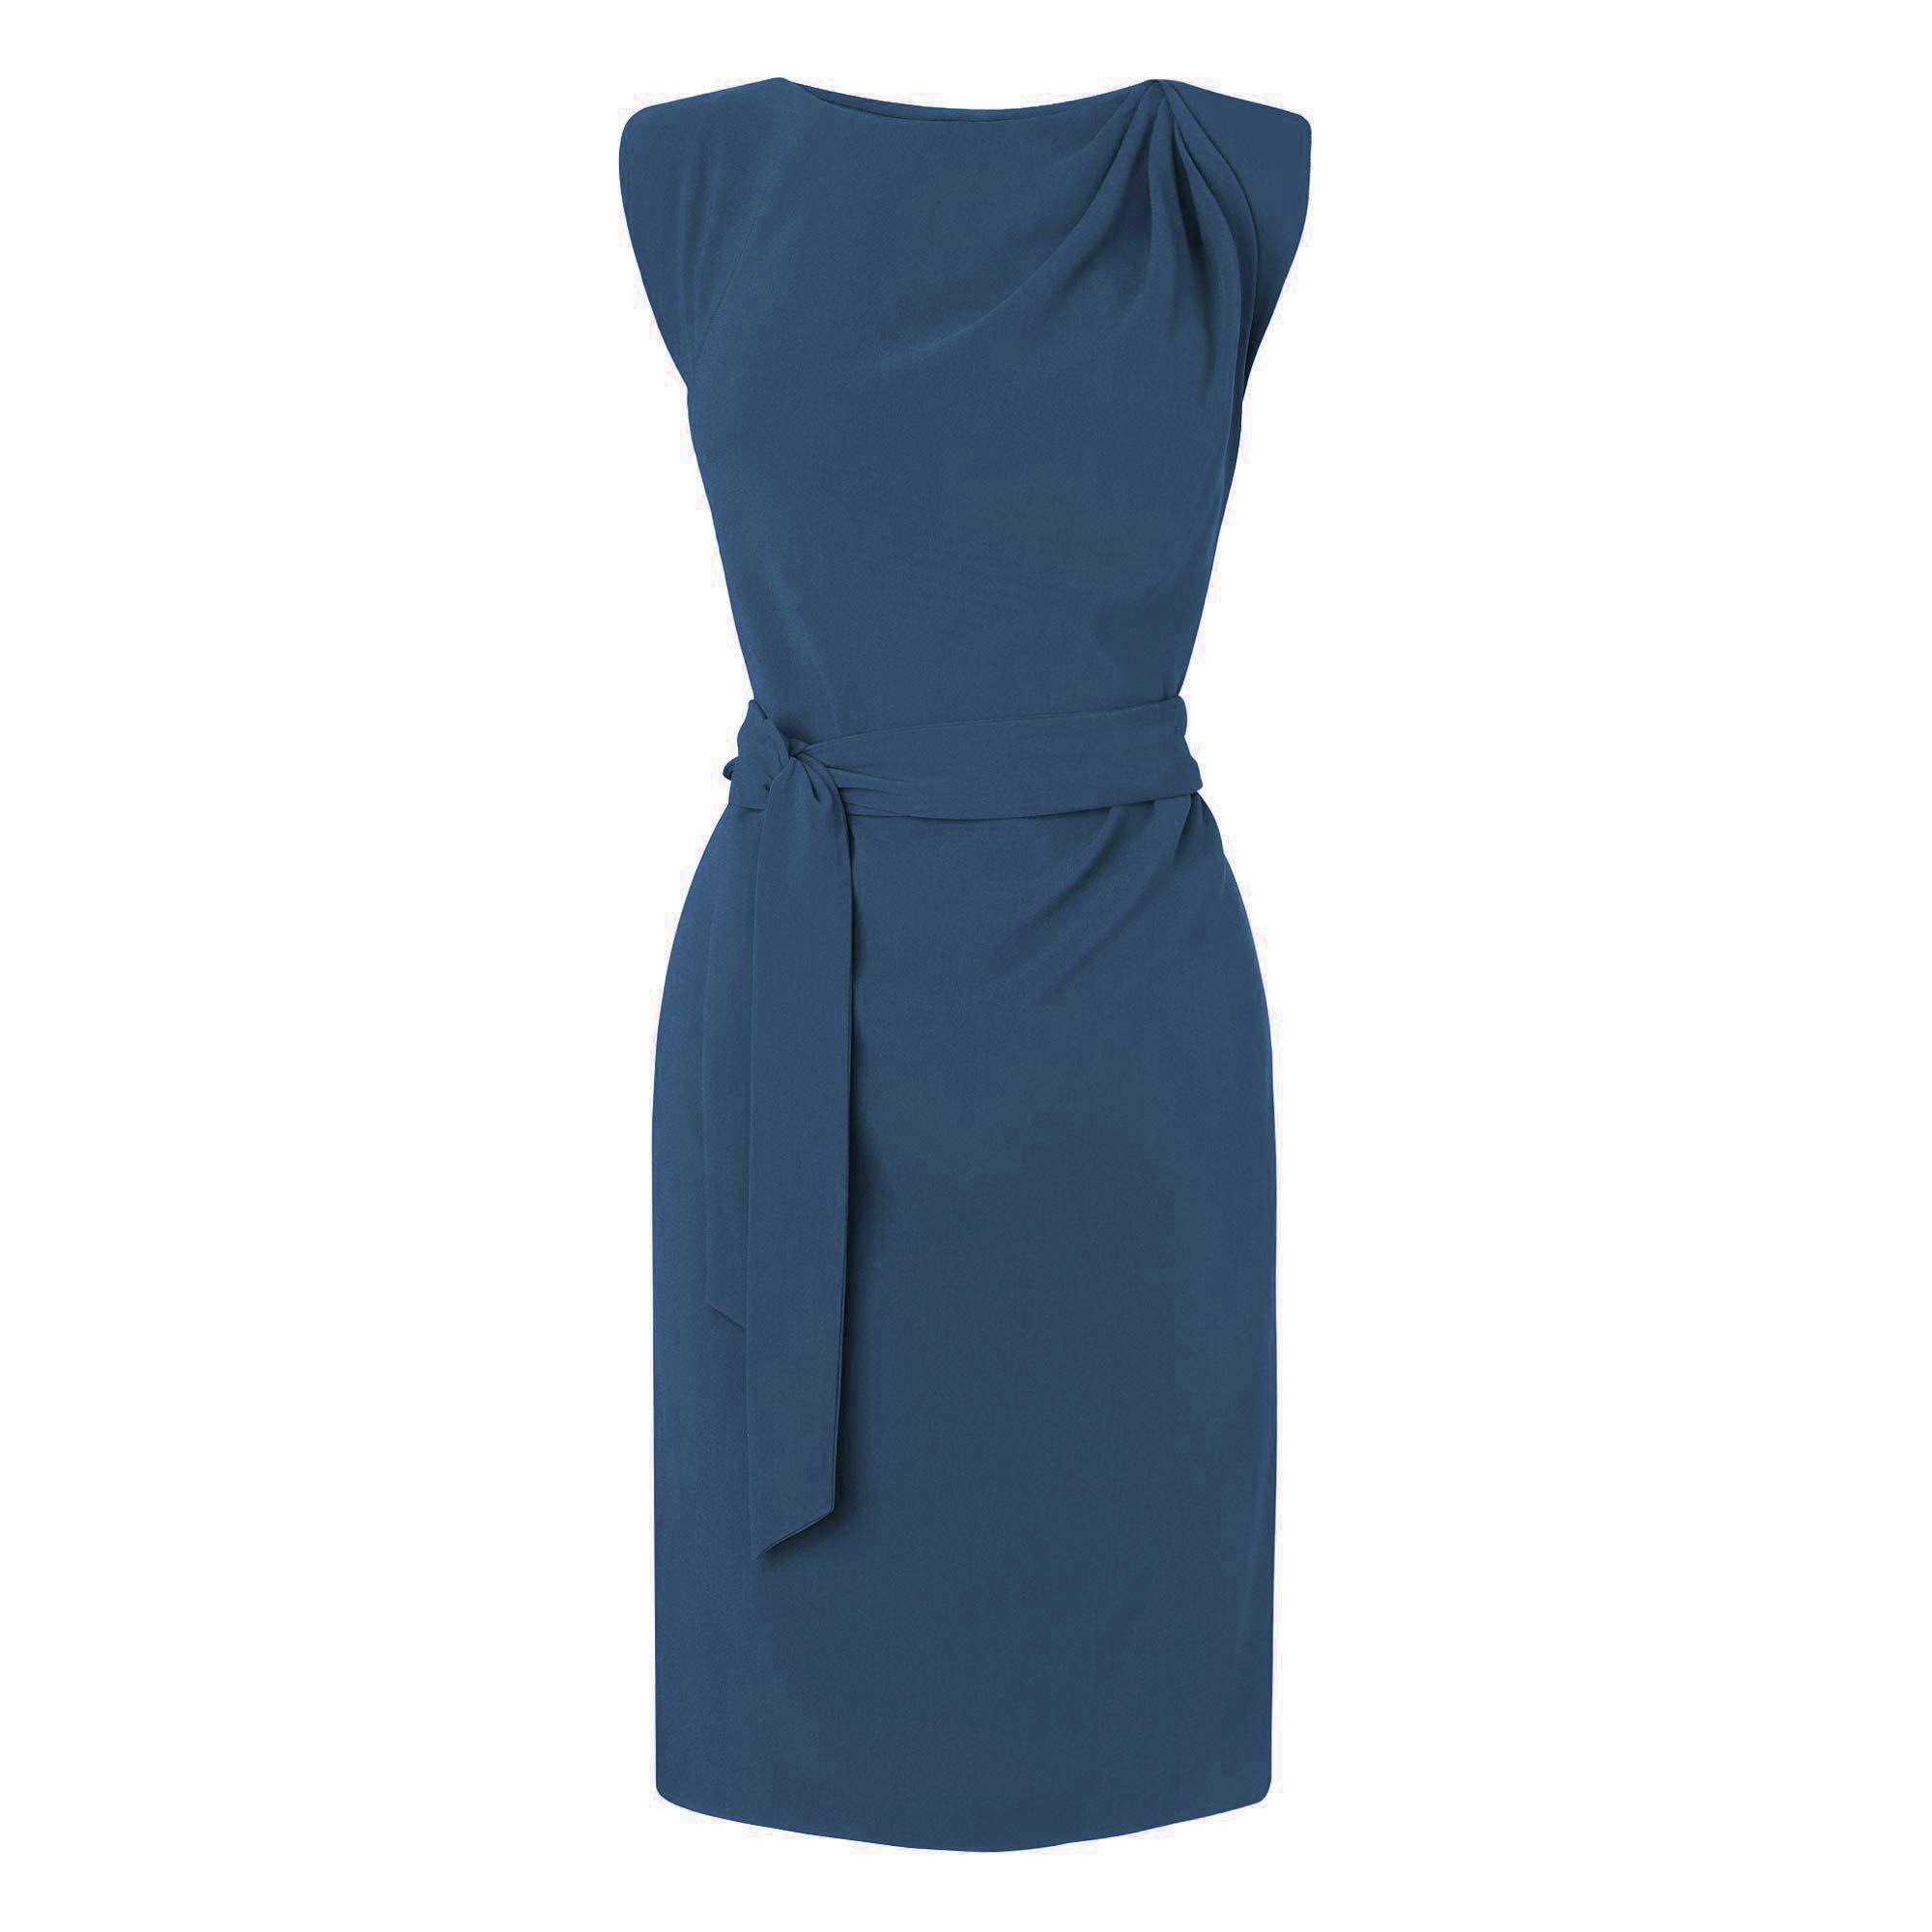 Women LK Bennett Clothing | Sale up to 60% | Nuji